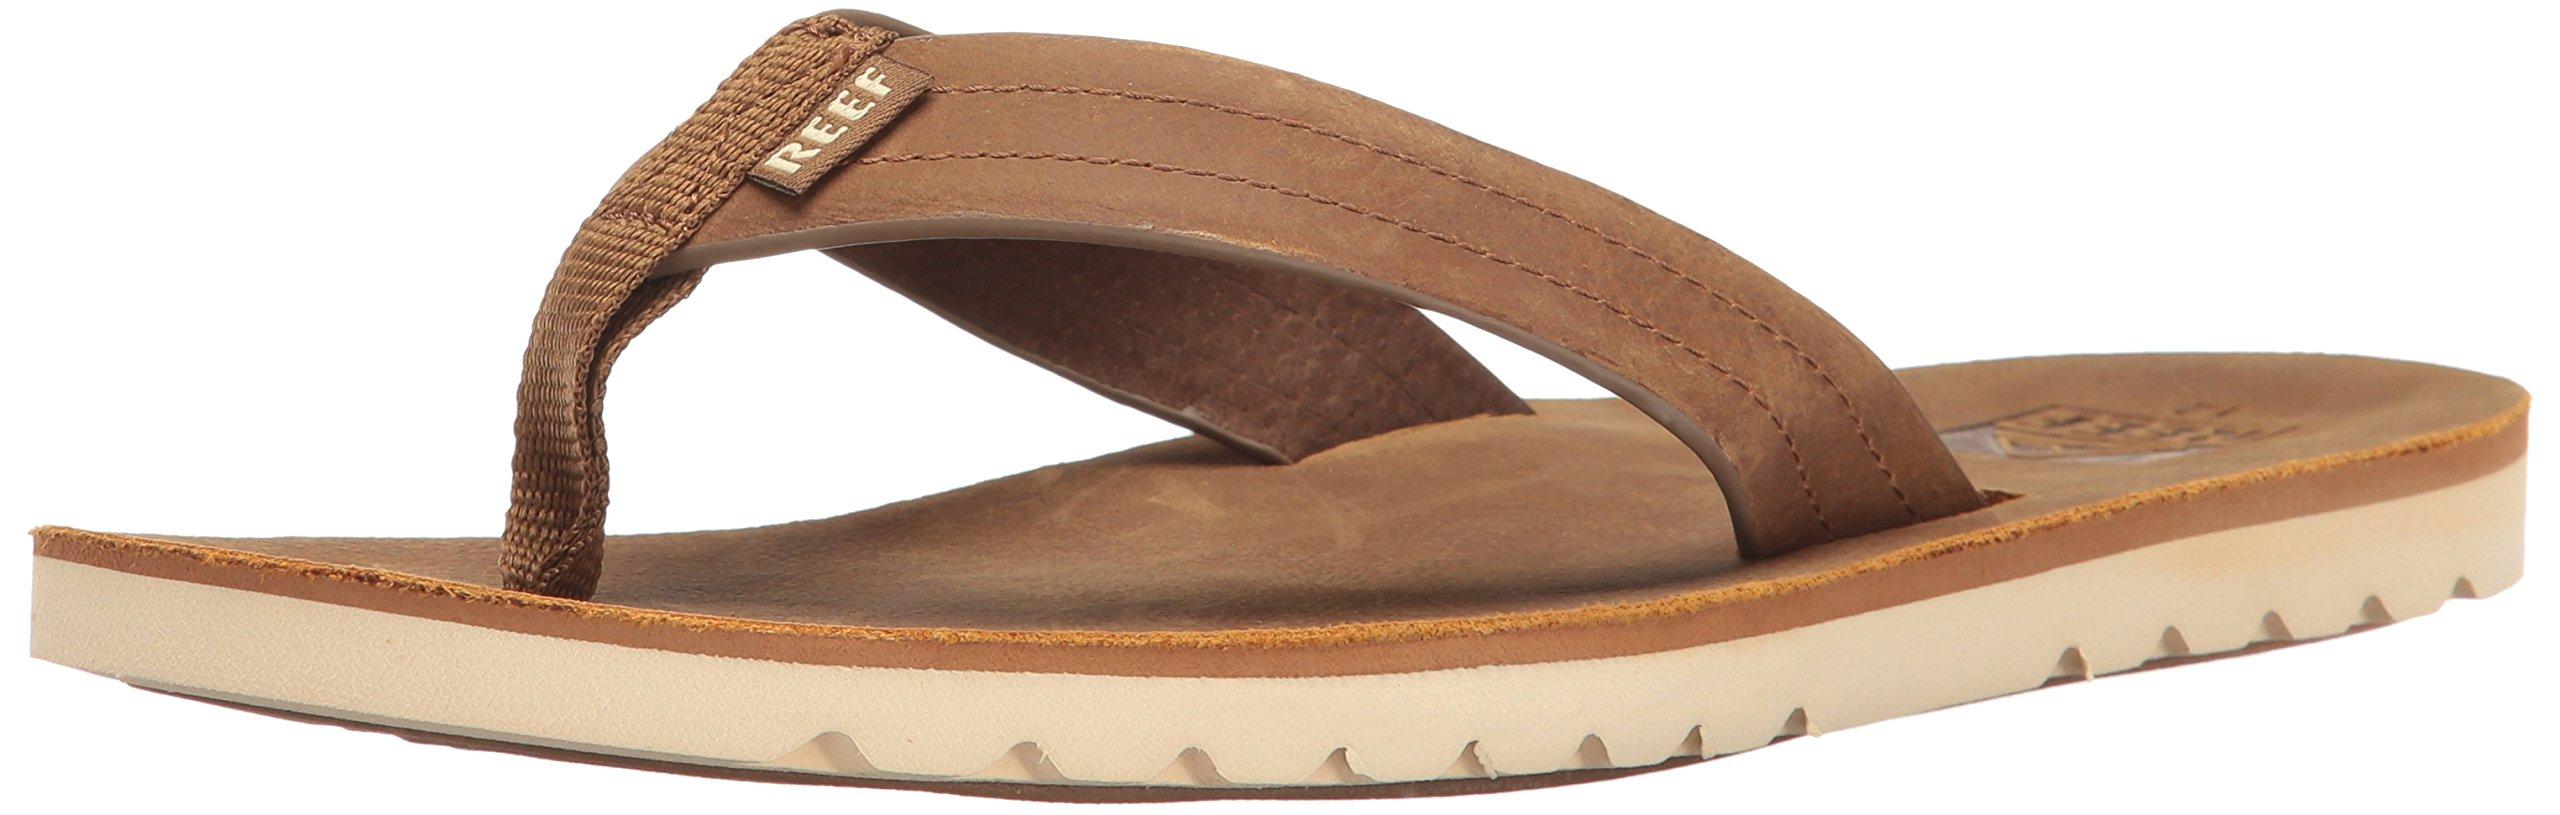 Reef Men's Voyage Le Sandal, Bronze/Brown, 11 M US